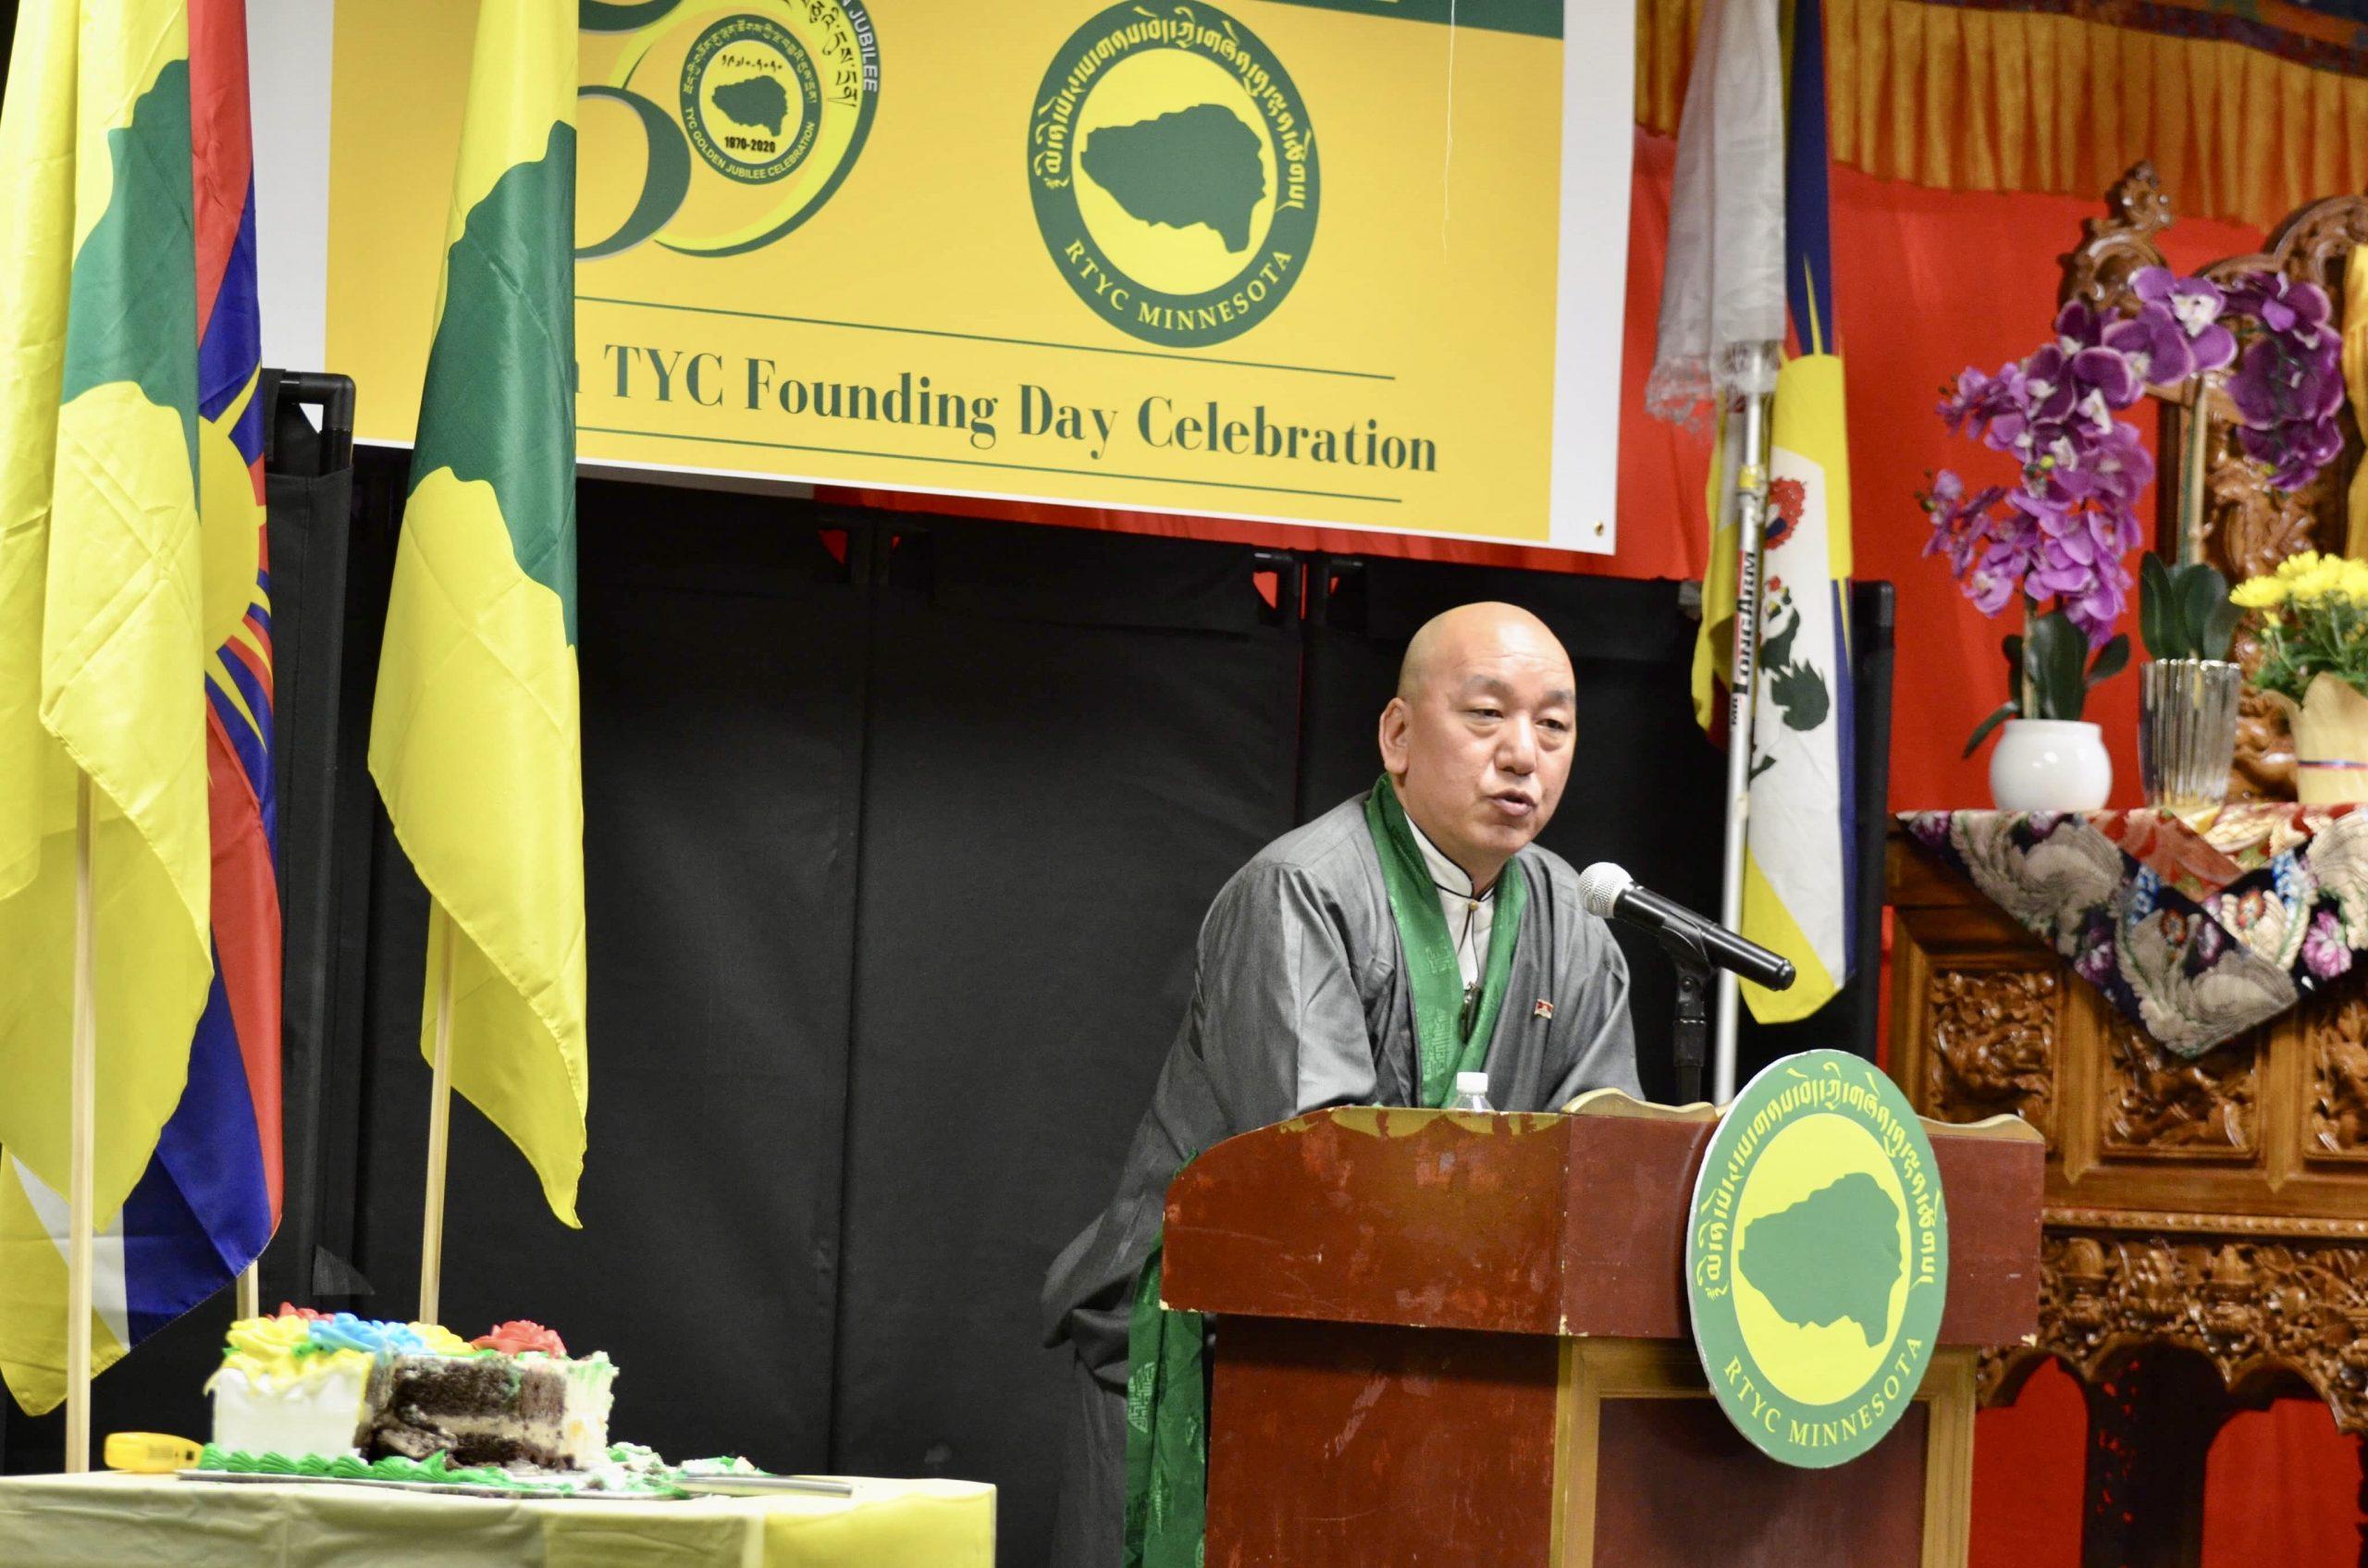 Parliamentarian Tsewang Rigzin addresses the 50th TYC Founding day celebration